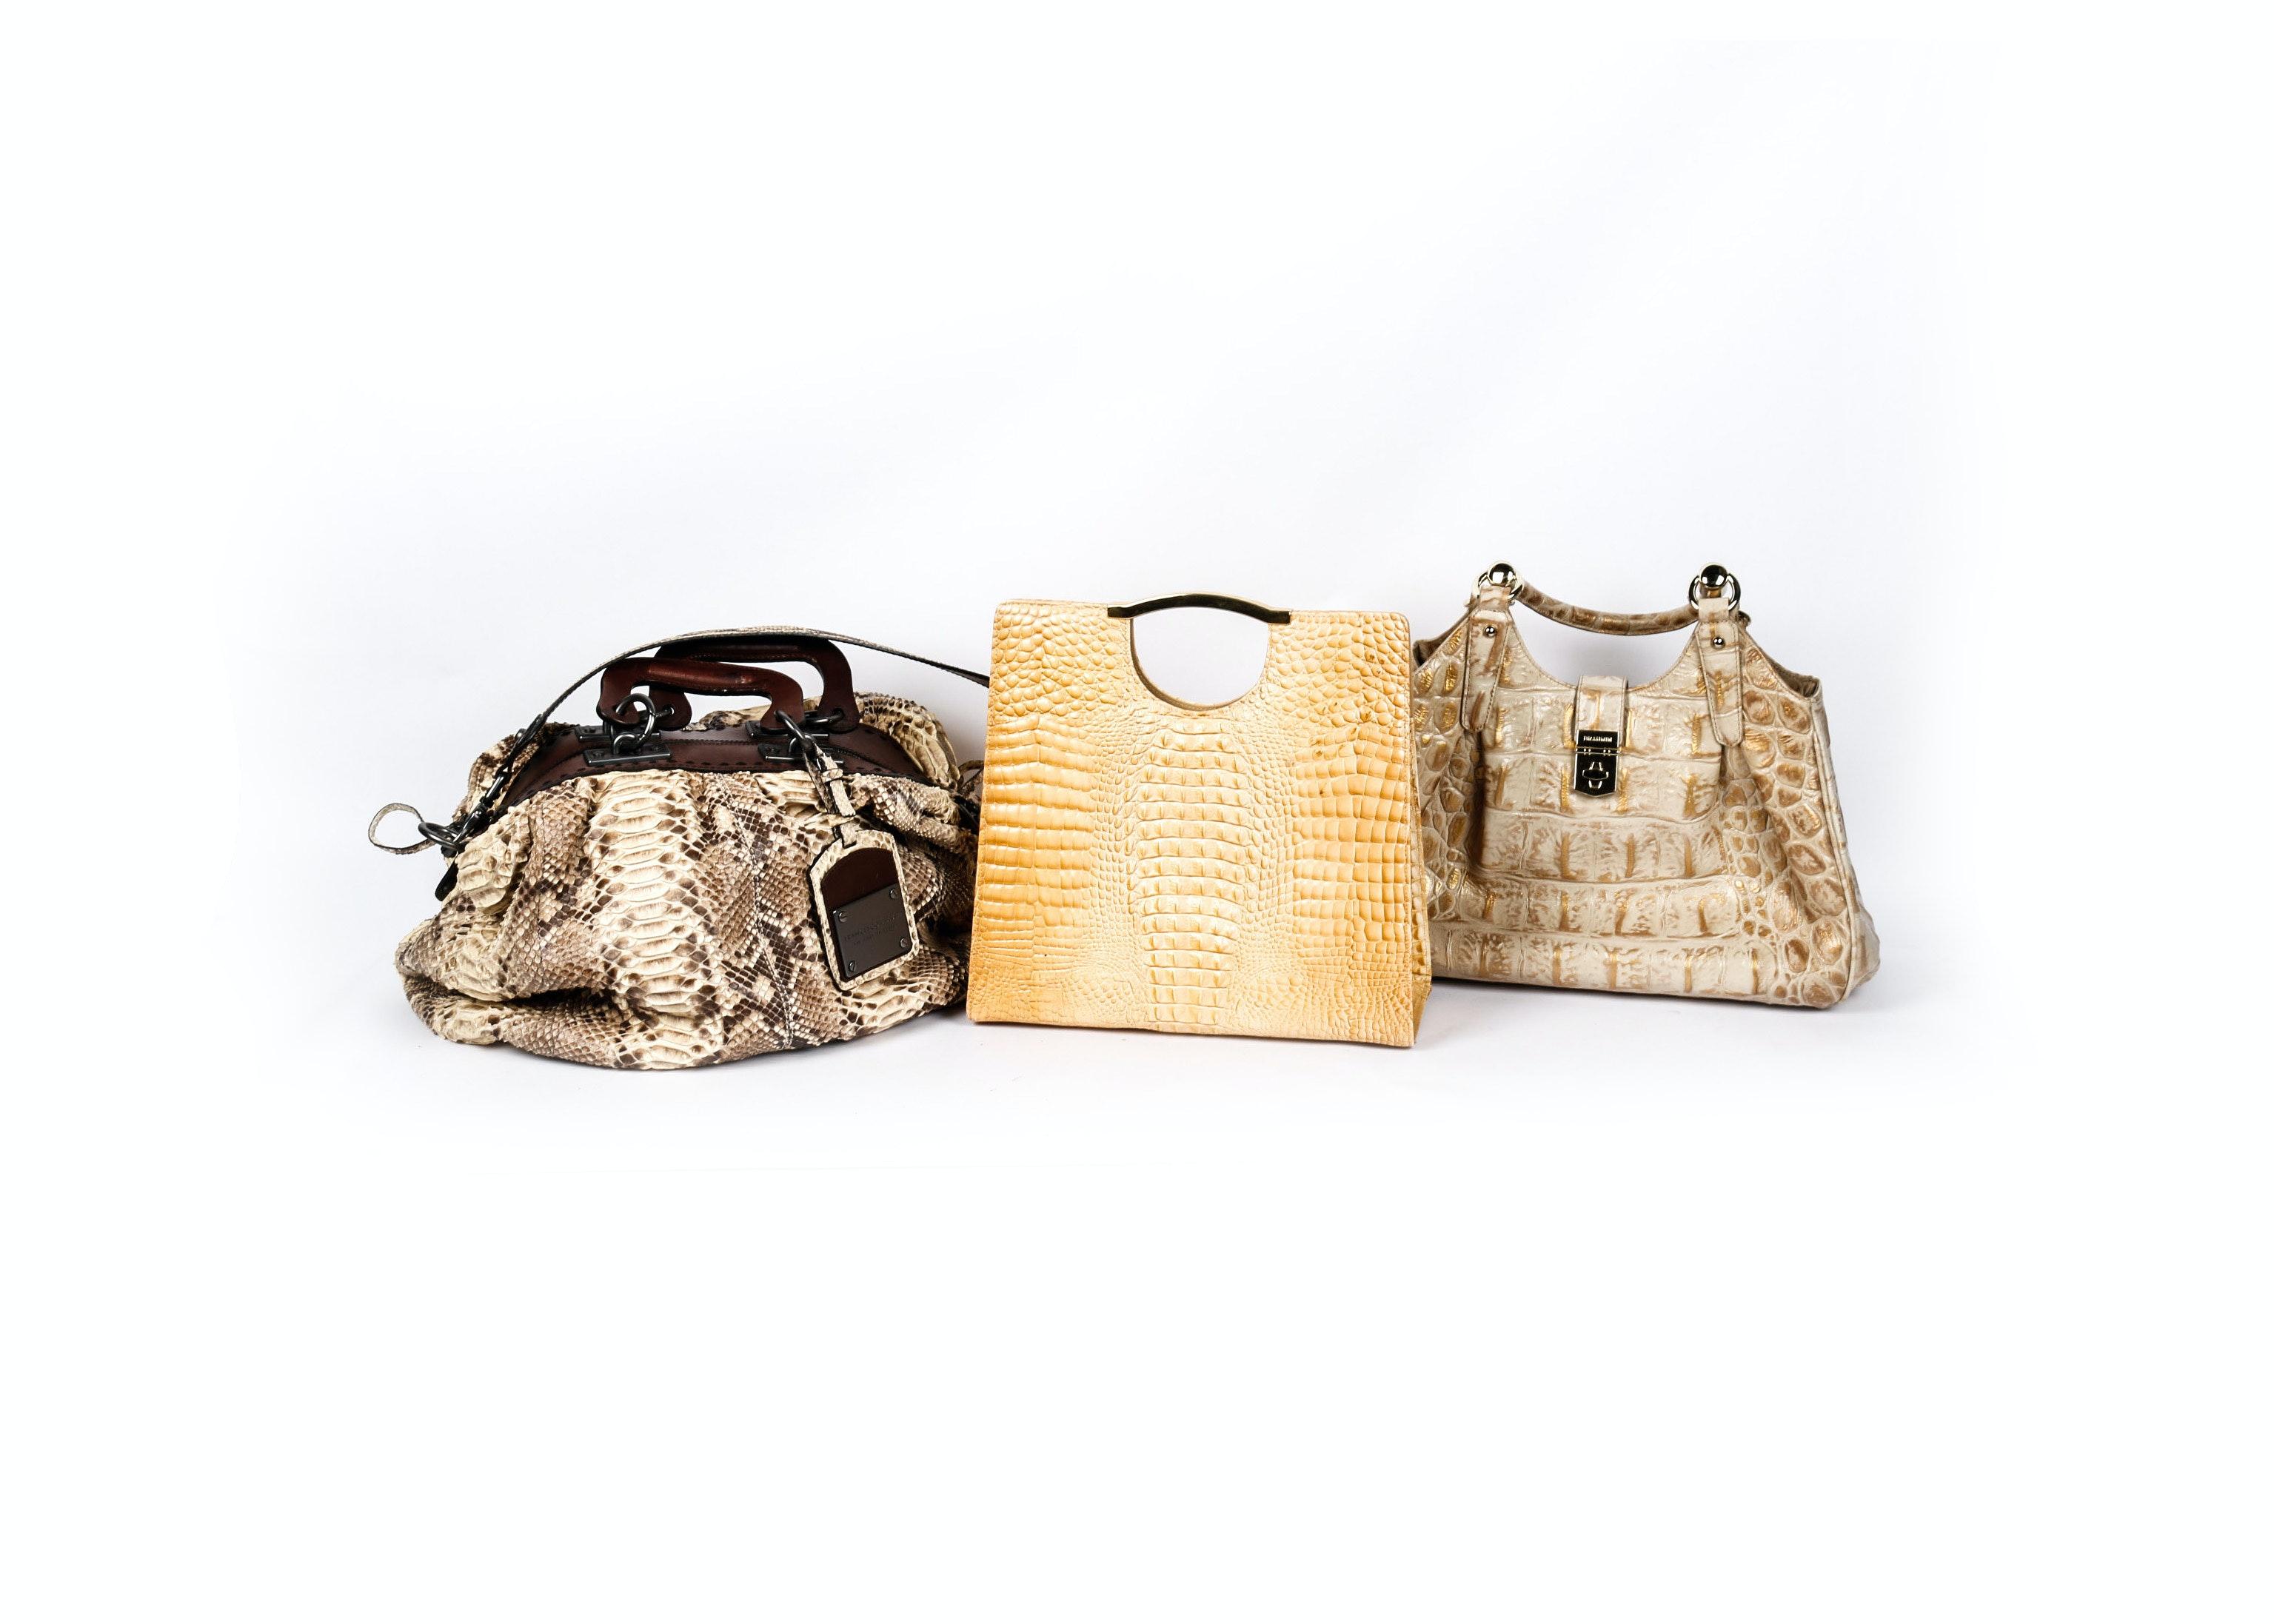 Three Faux Snakeskin Leather Handbags